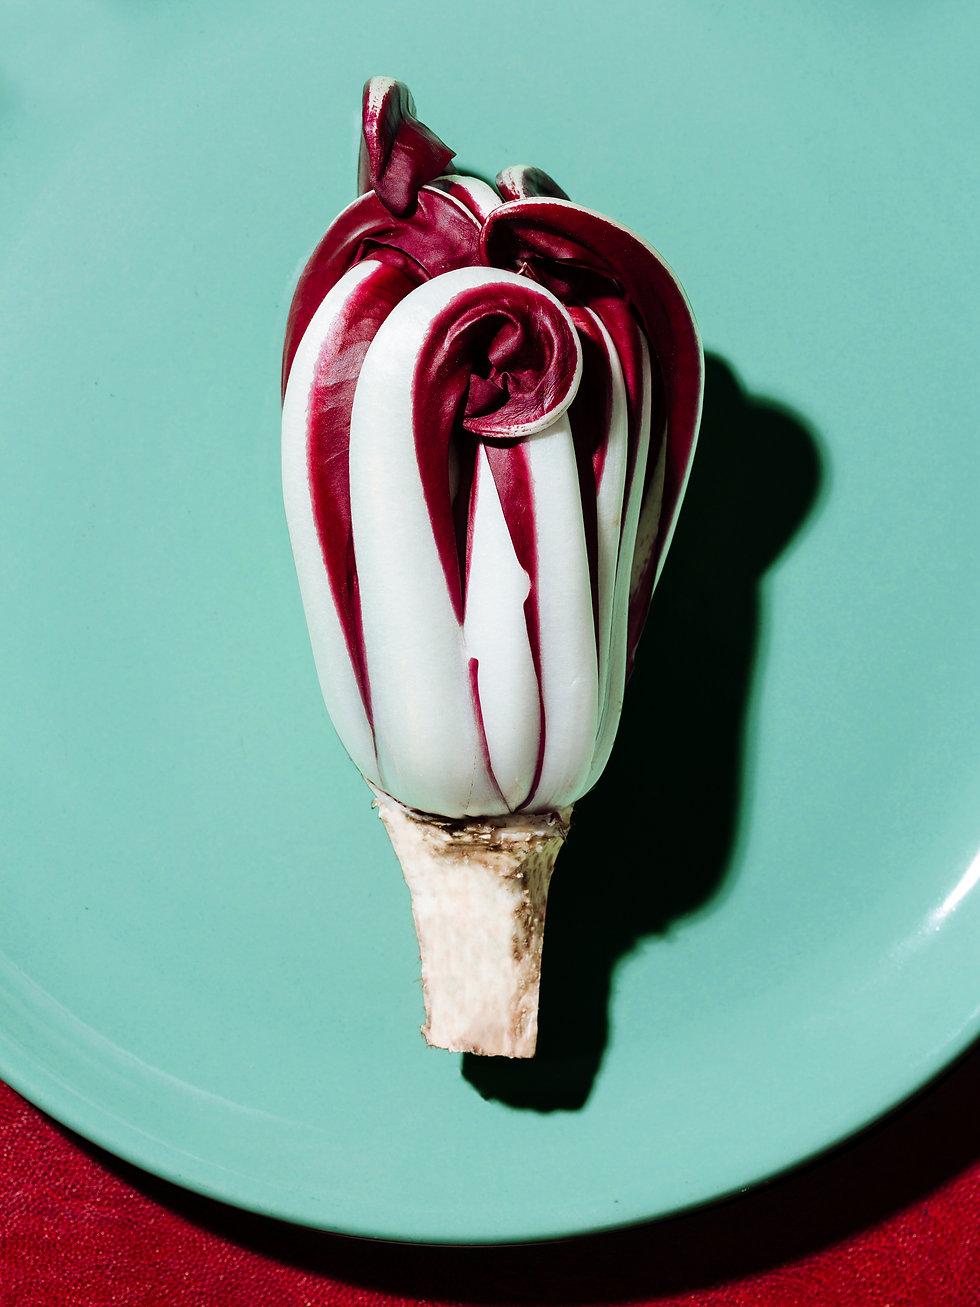 A purple-white radicchio on a plate